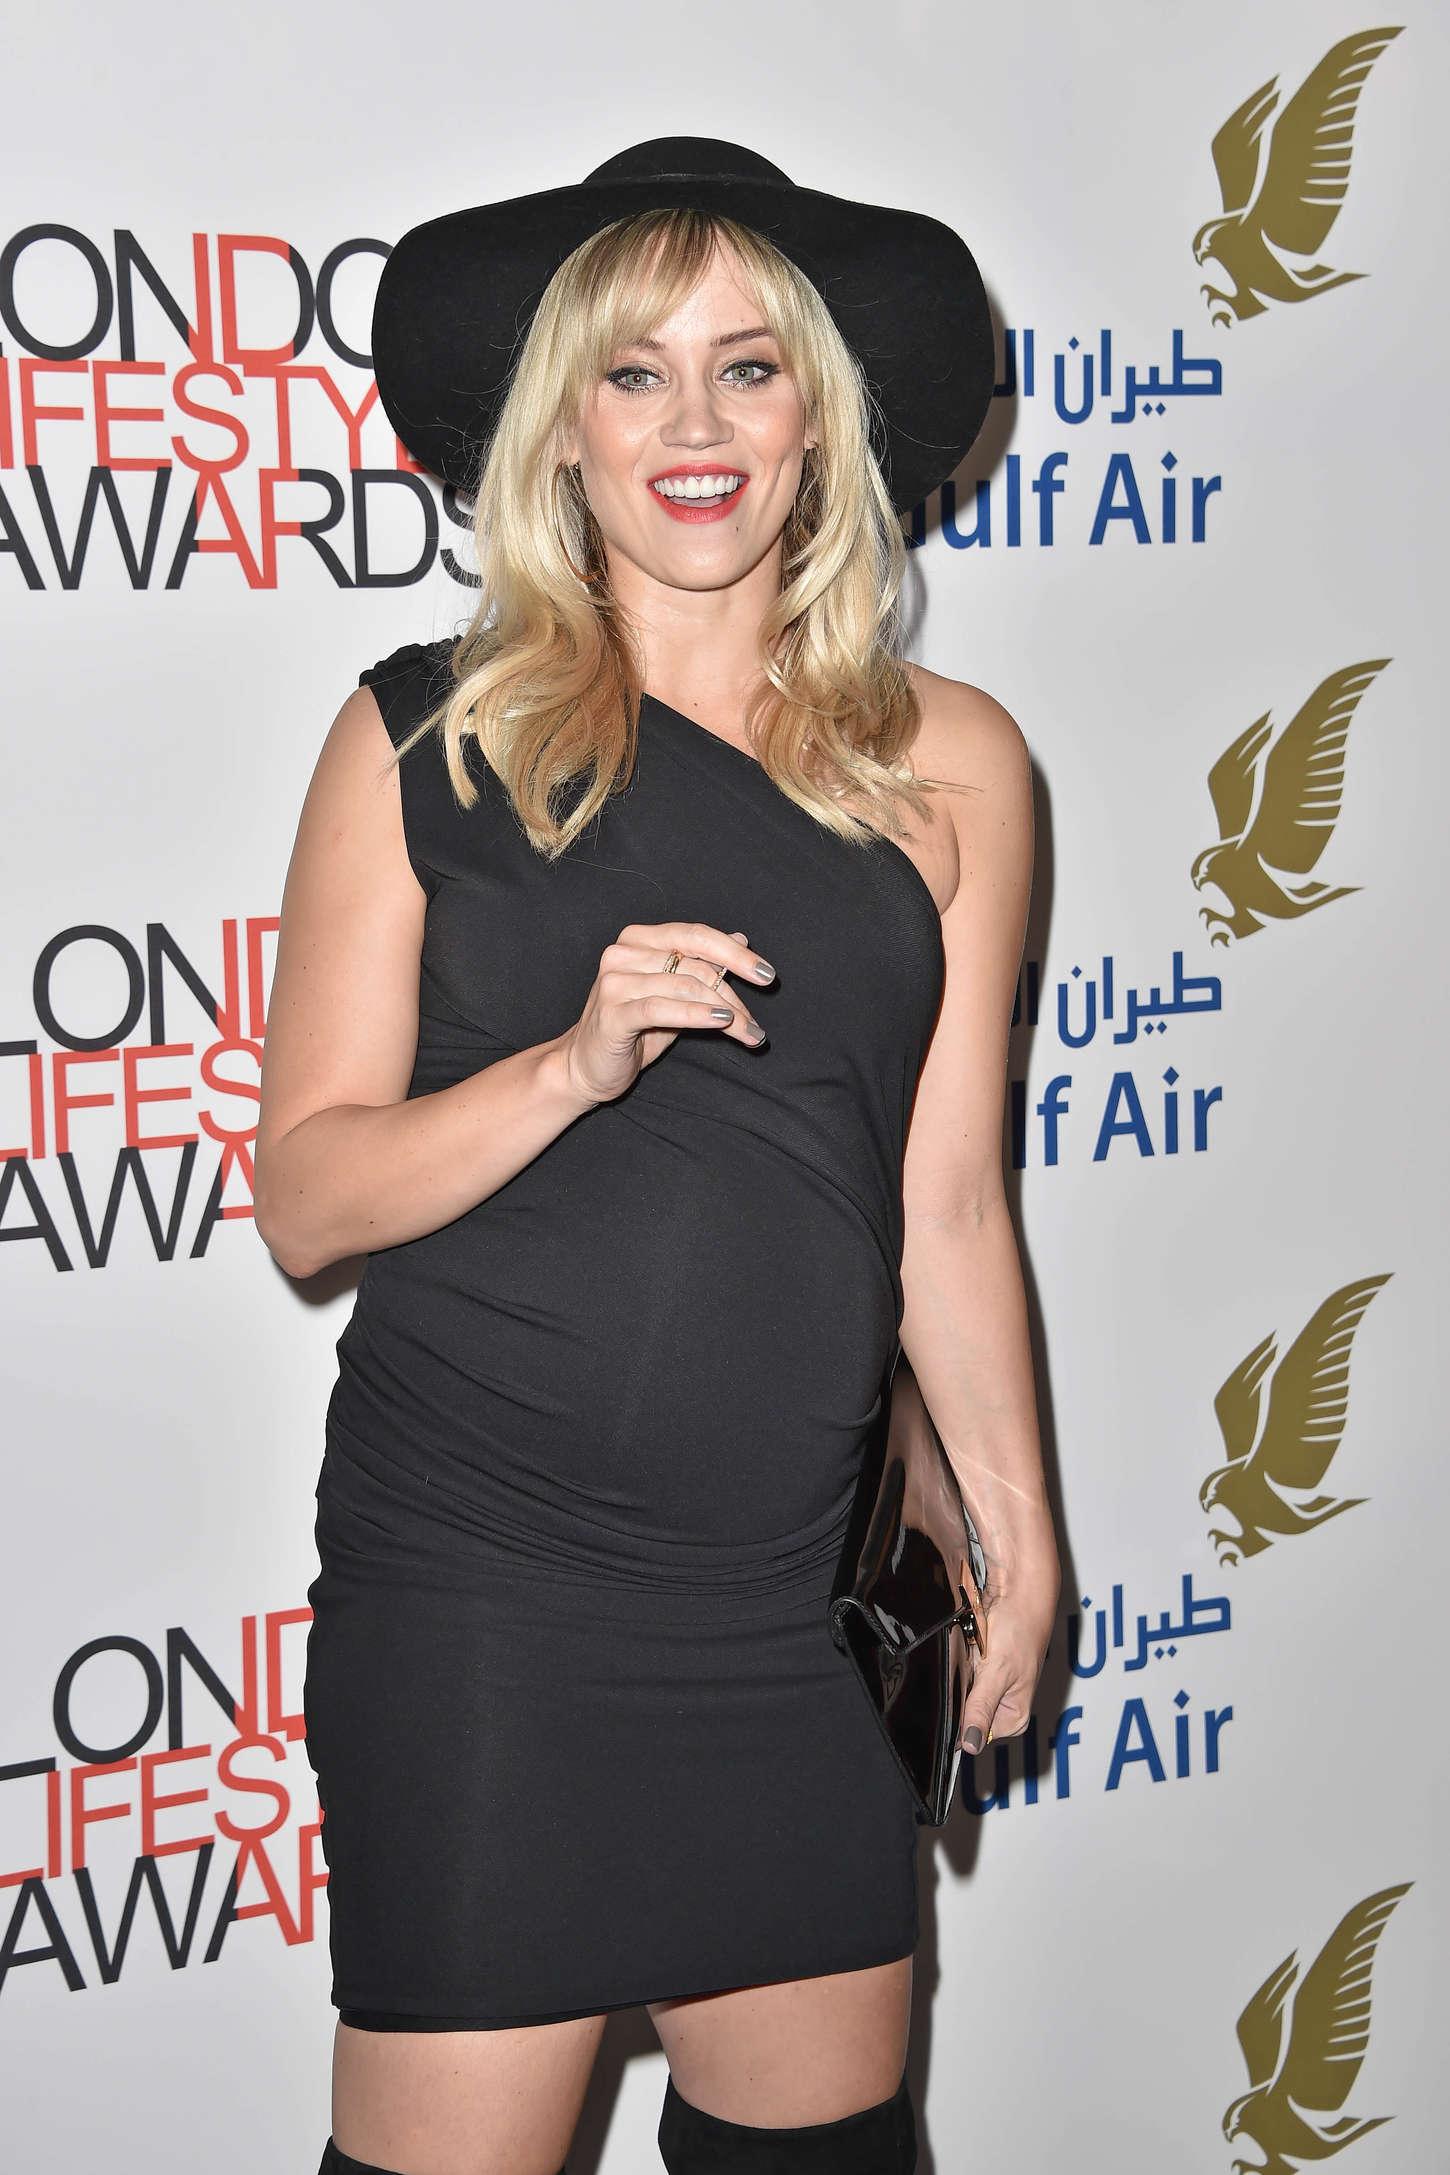 Kimberley Wyatt at London Lifestyle Awards